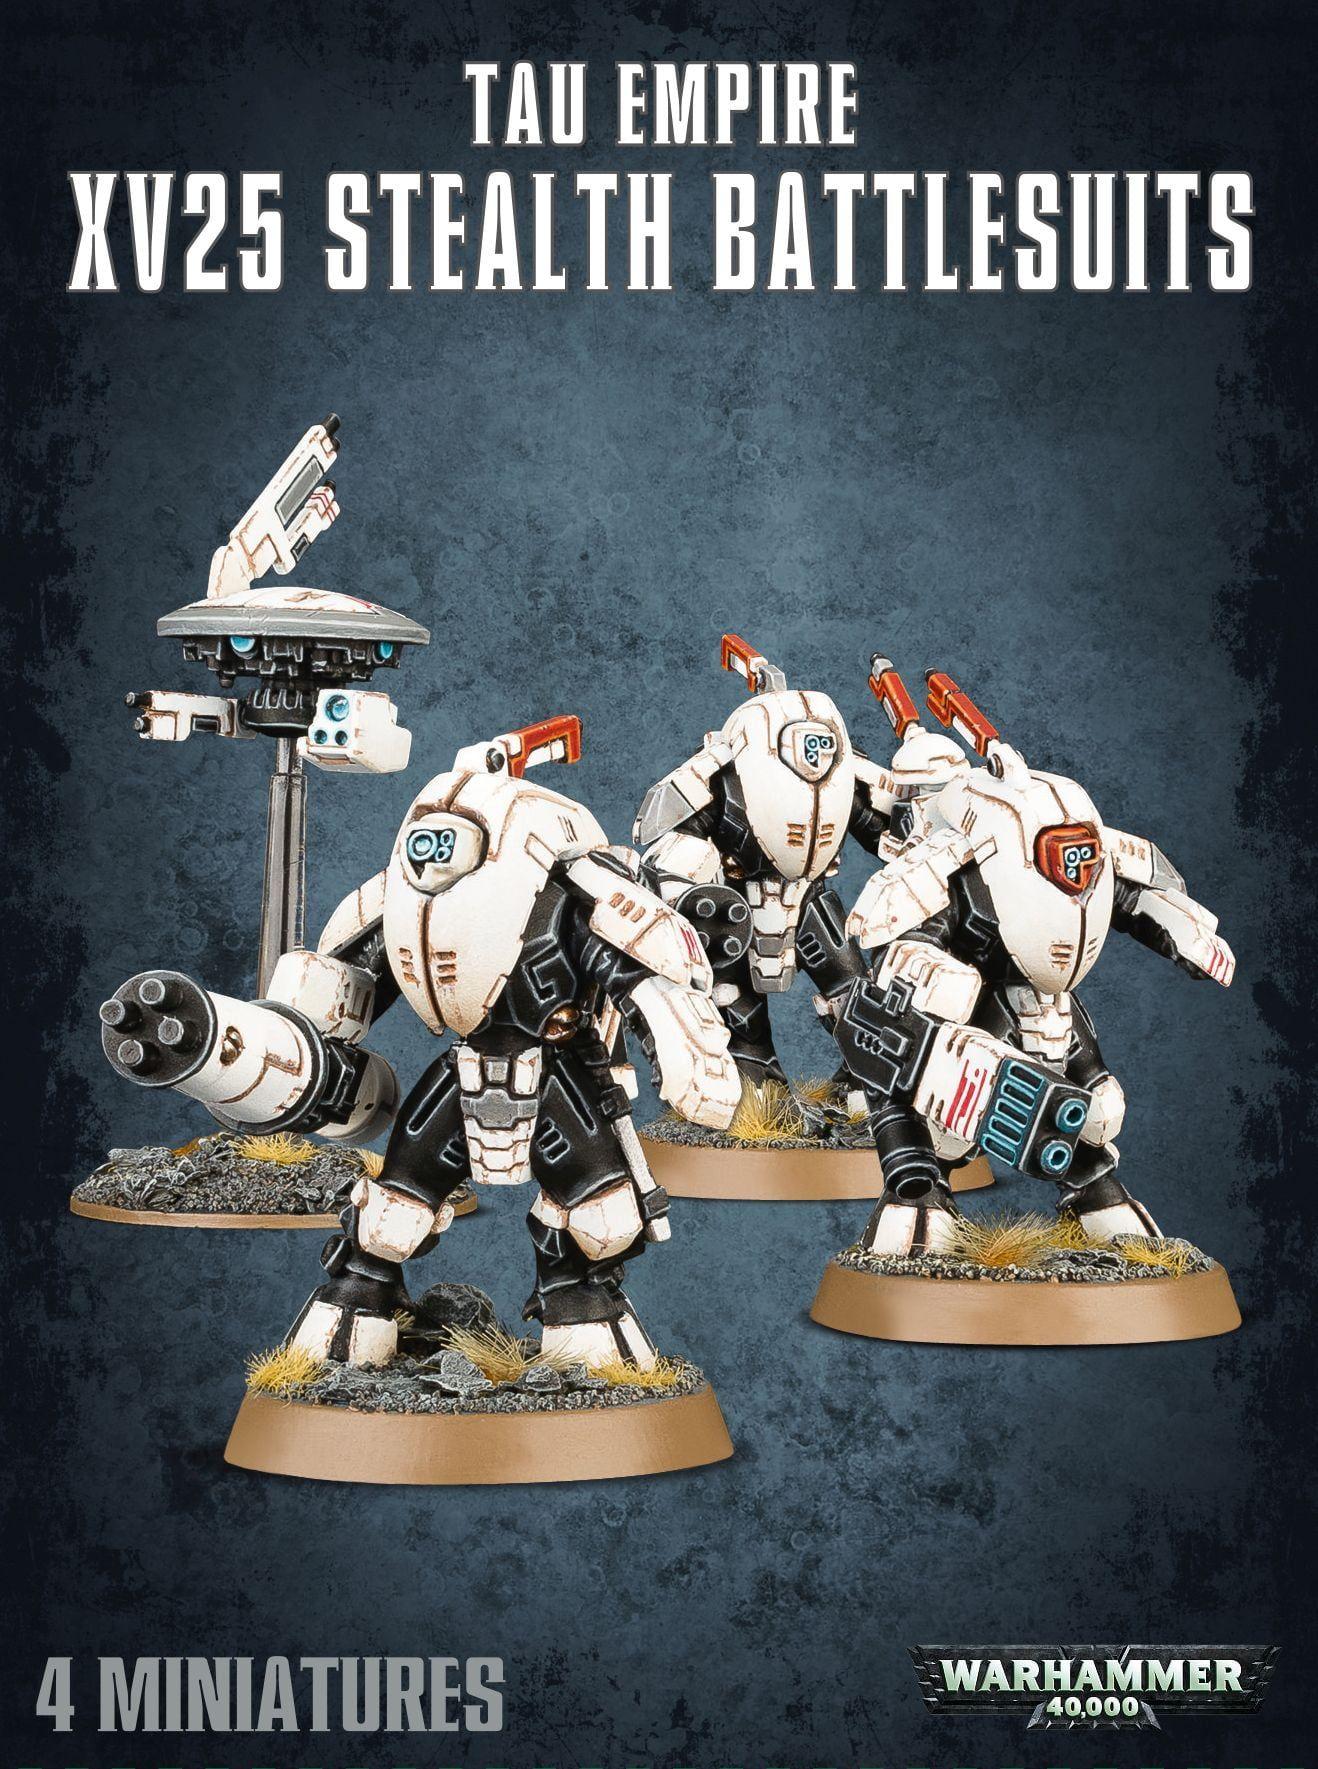 Warhammer Tau Em XV25 Stealth Battlesuits